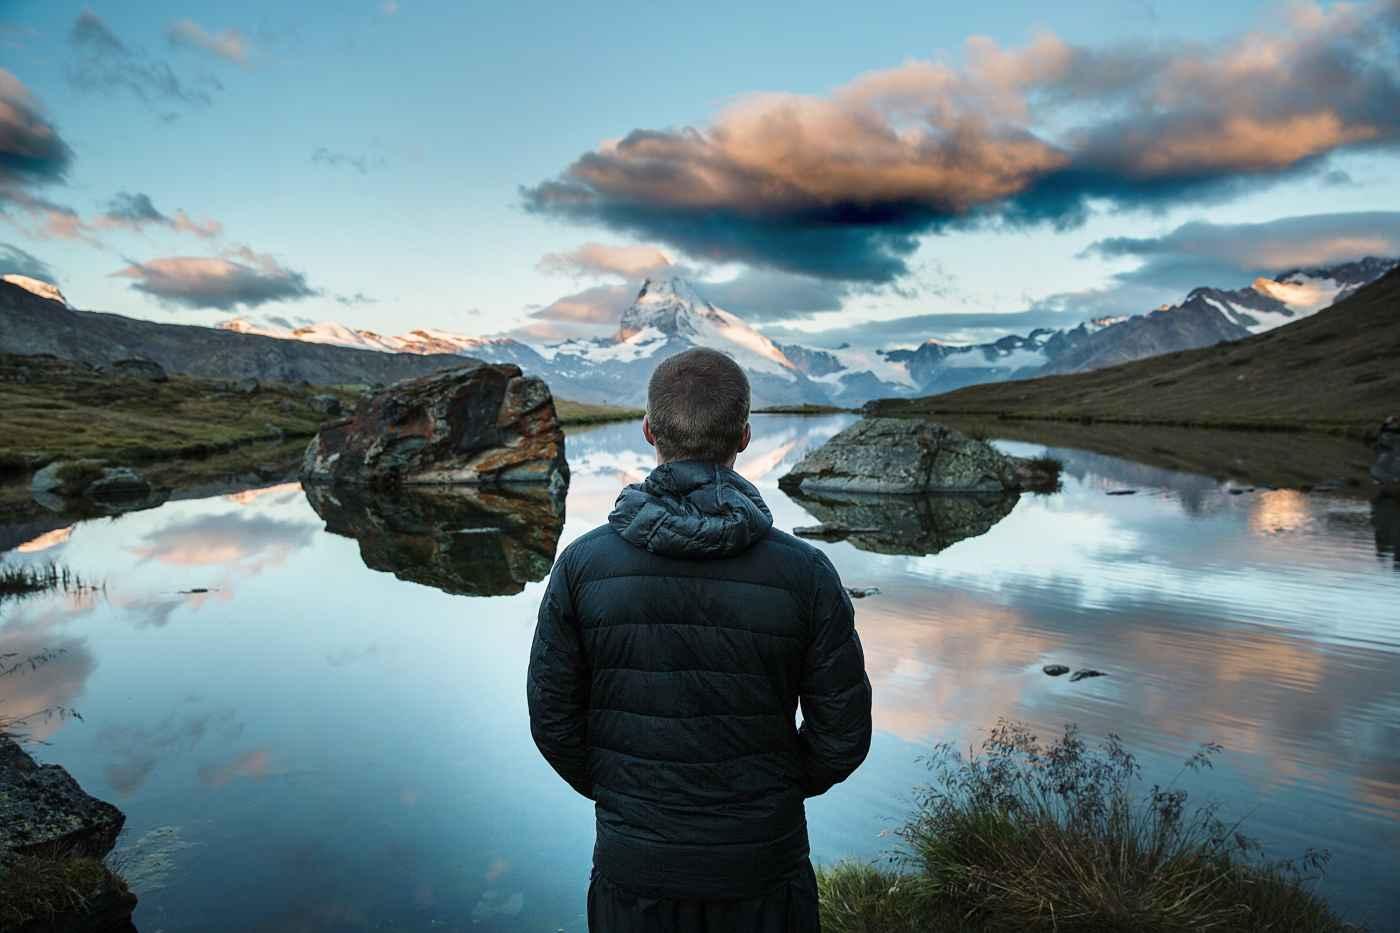 man looking across a lake to a mountain range